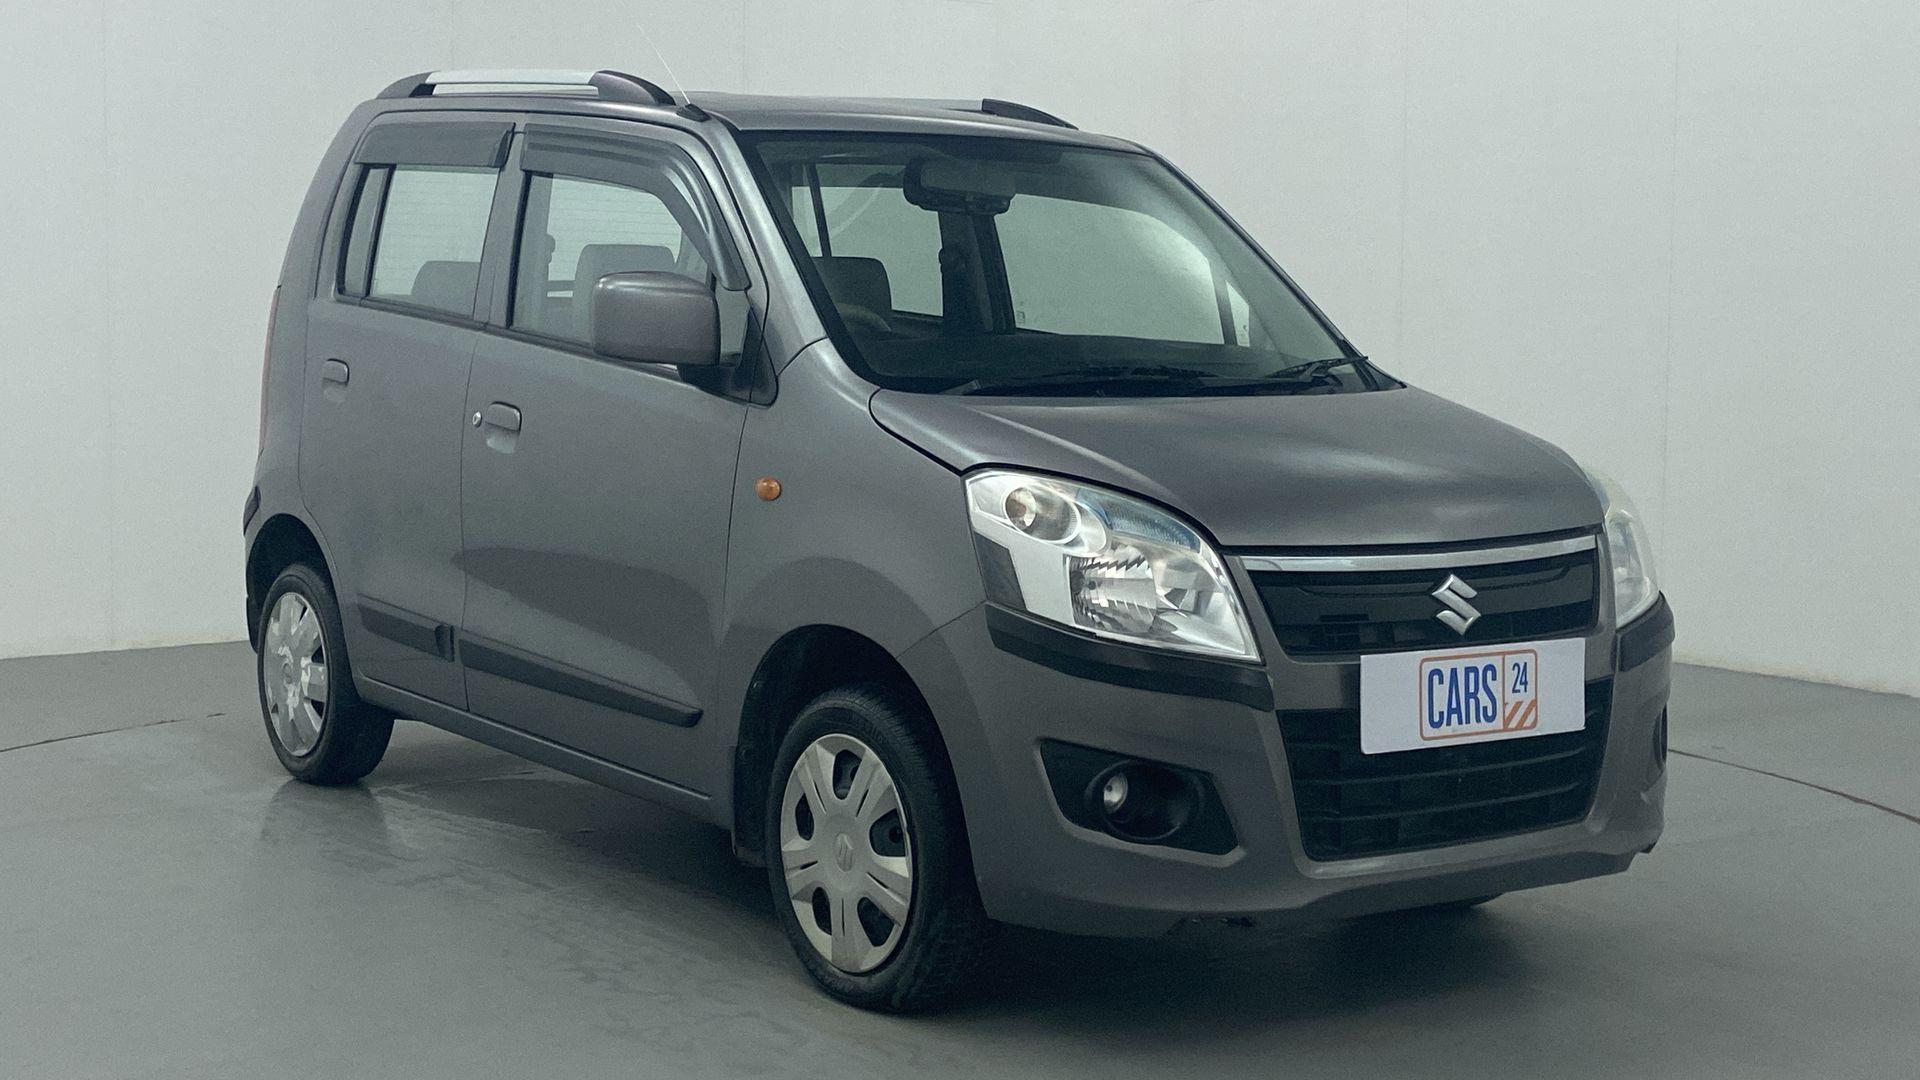 2015 Maruti Wagon R 1.0 VXI